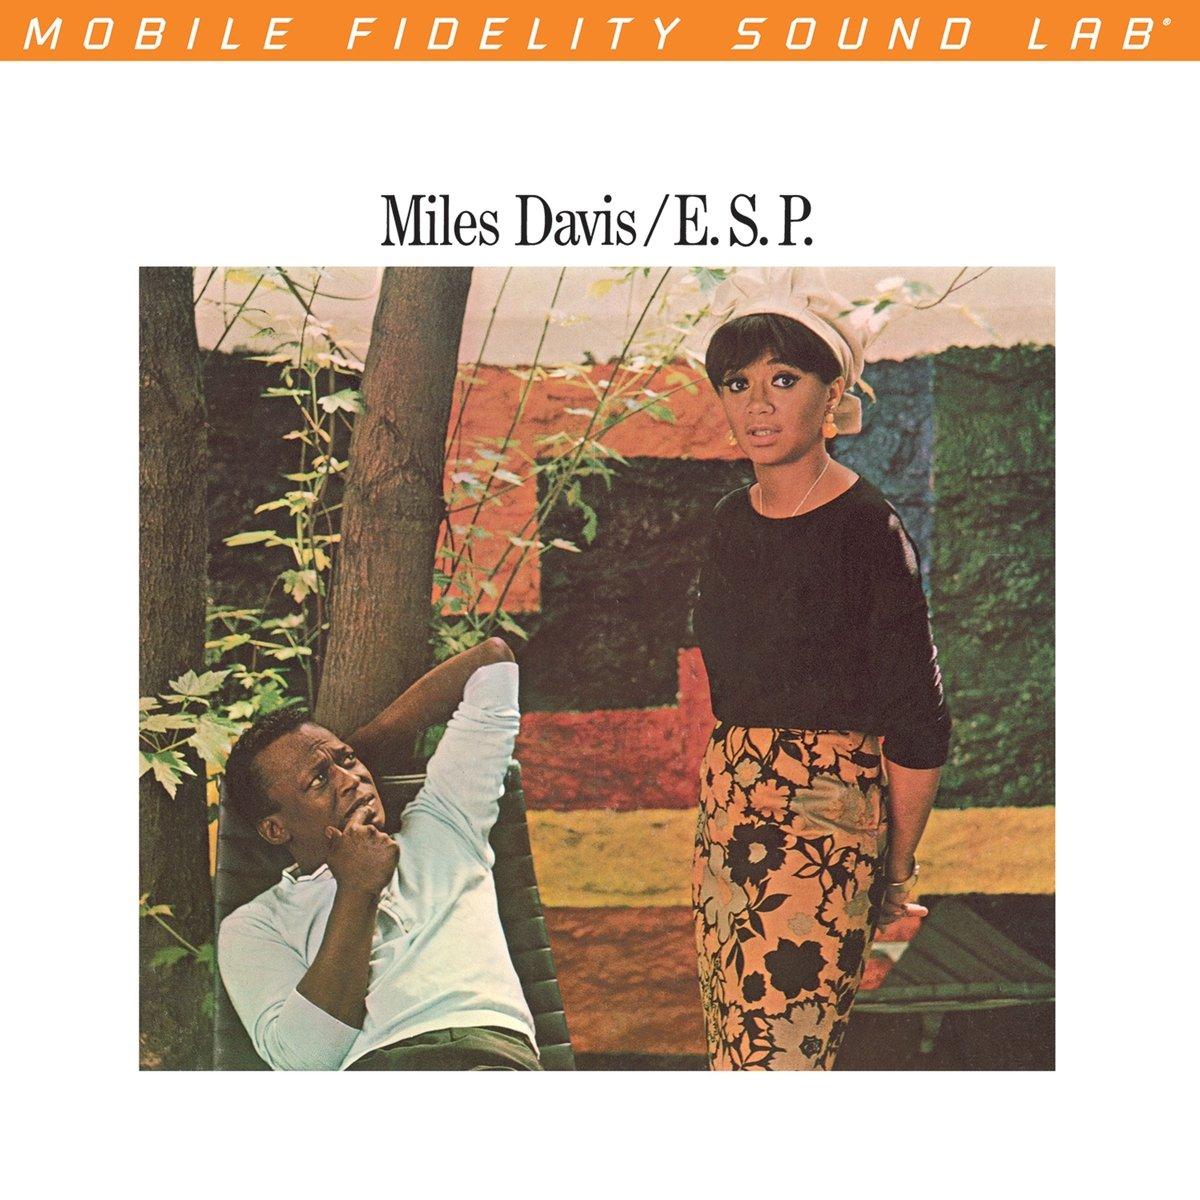 SACD : Miles Davis - E.s.p. (SACD)